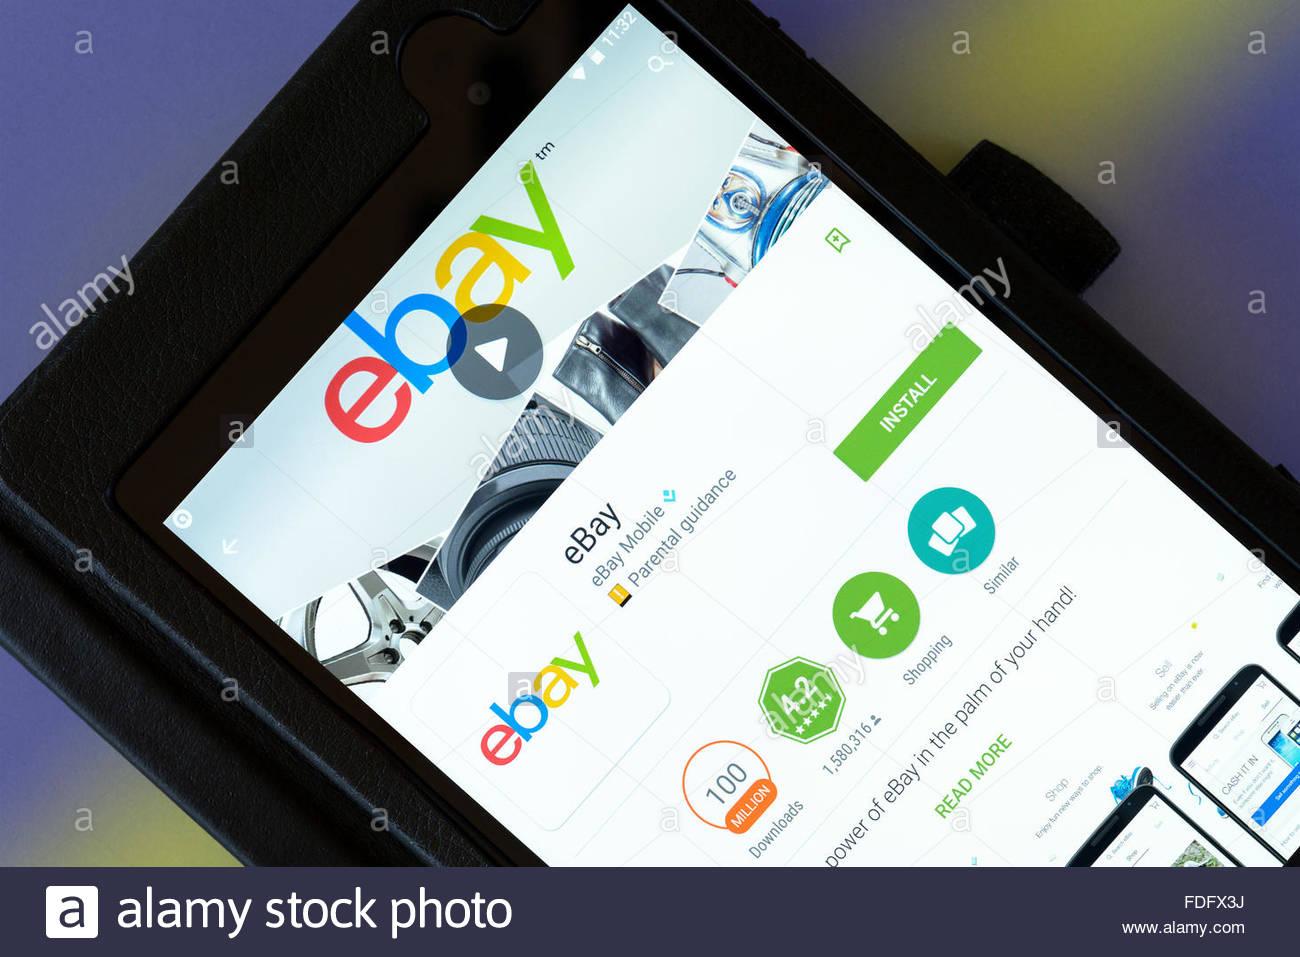 E-commerce app for eBay on an android tablet PC, Dorset